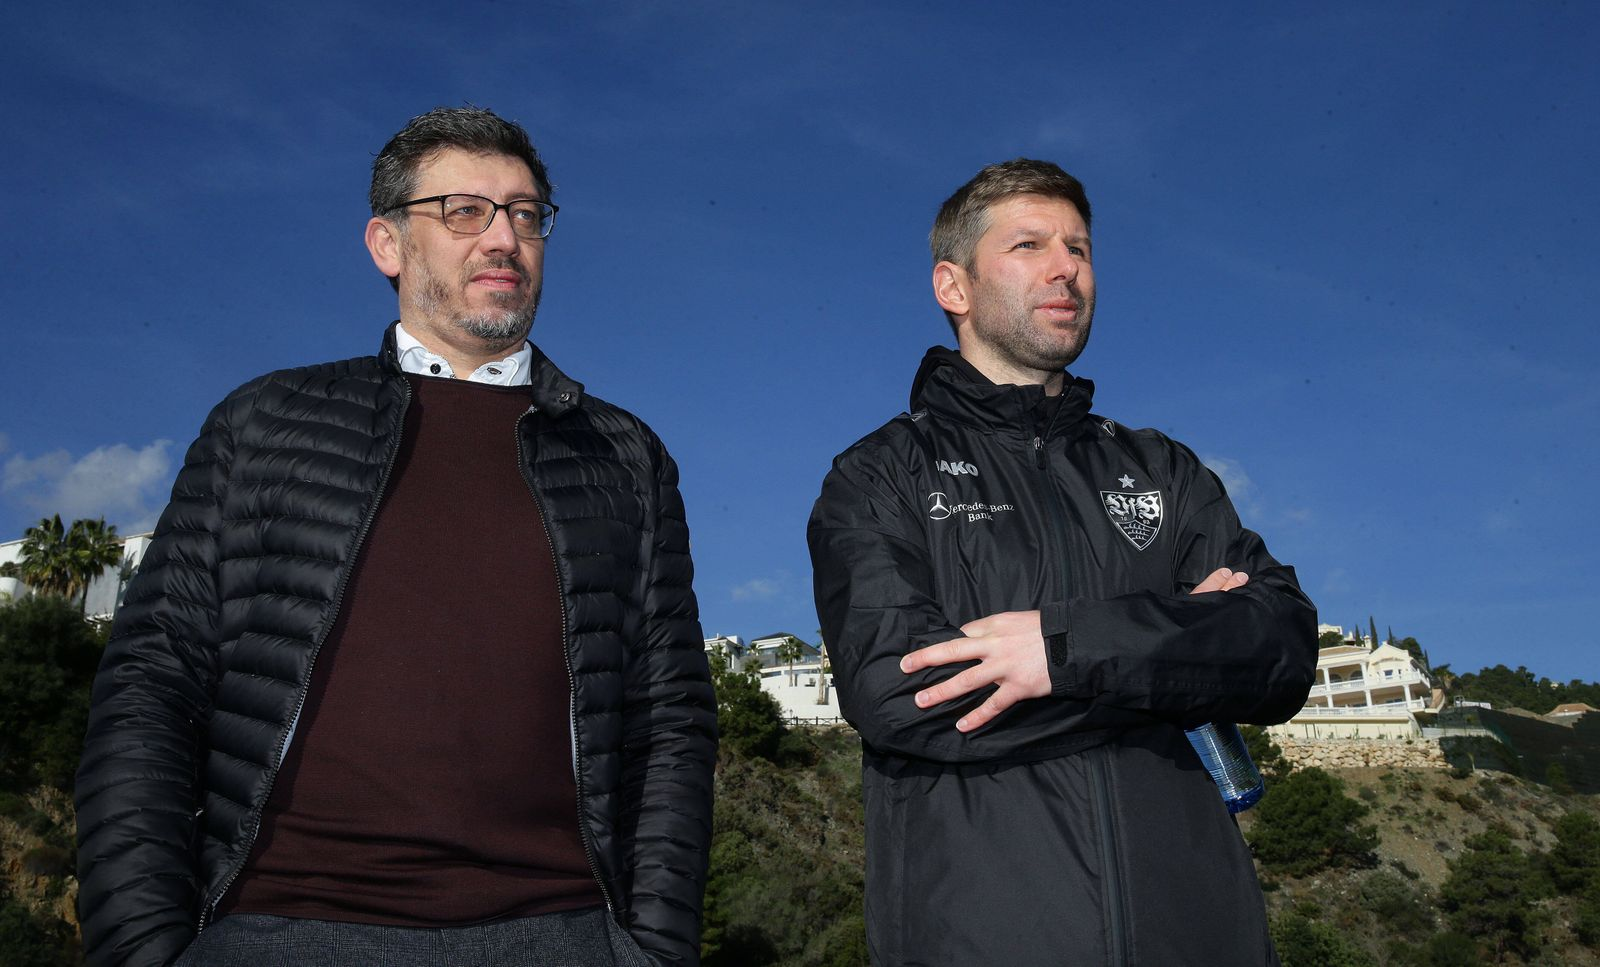 Marbella , Fußball Trainingslager VfB Stuttgart , von links: Claus Vogt ( Präsident ) / Thomas Hitzlsperger ( Vorstands